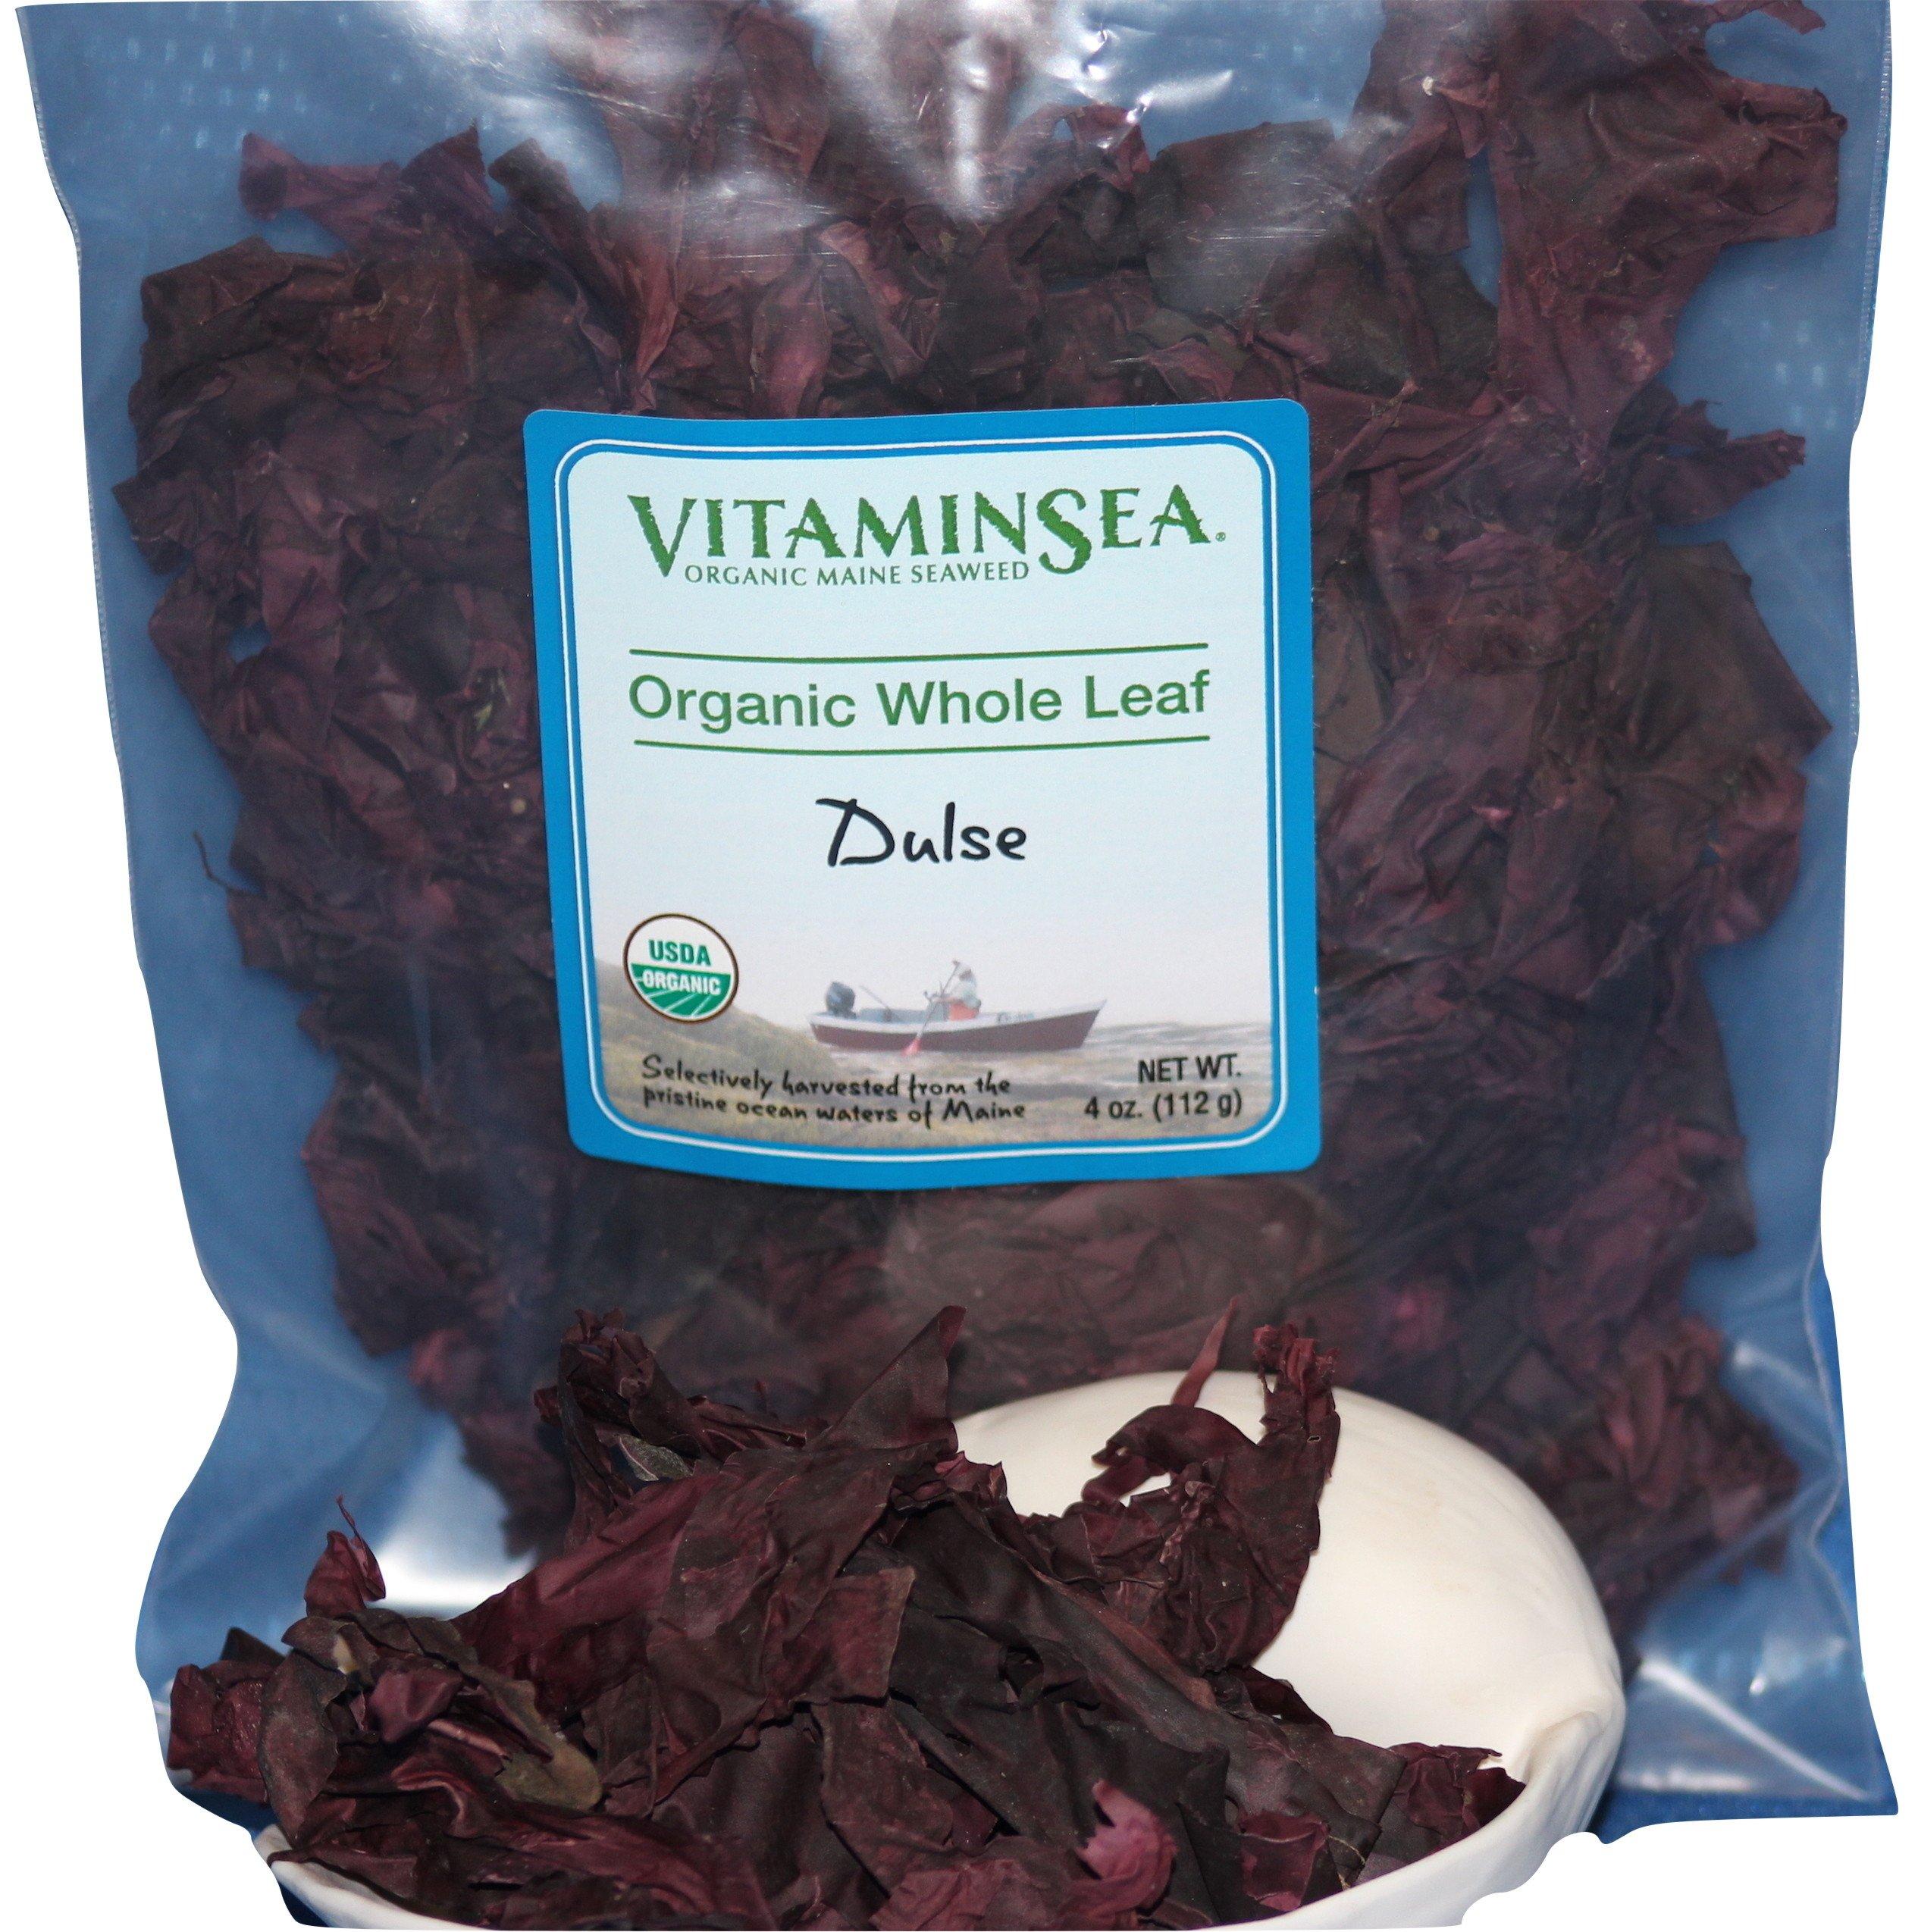 Organic Dulse Whole Leaf Maine - Seaweed 4 oz bag - USDA & Vegan Certified - Kosher - Hand Harvested from the Atlantic Ocean Coast - Sun Dried Raw and Wild Sea Vegetables VitaminSea (Dulse WL, 4 oz)